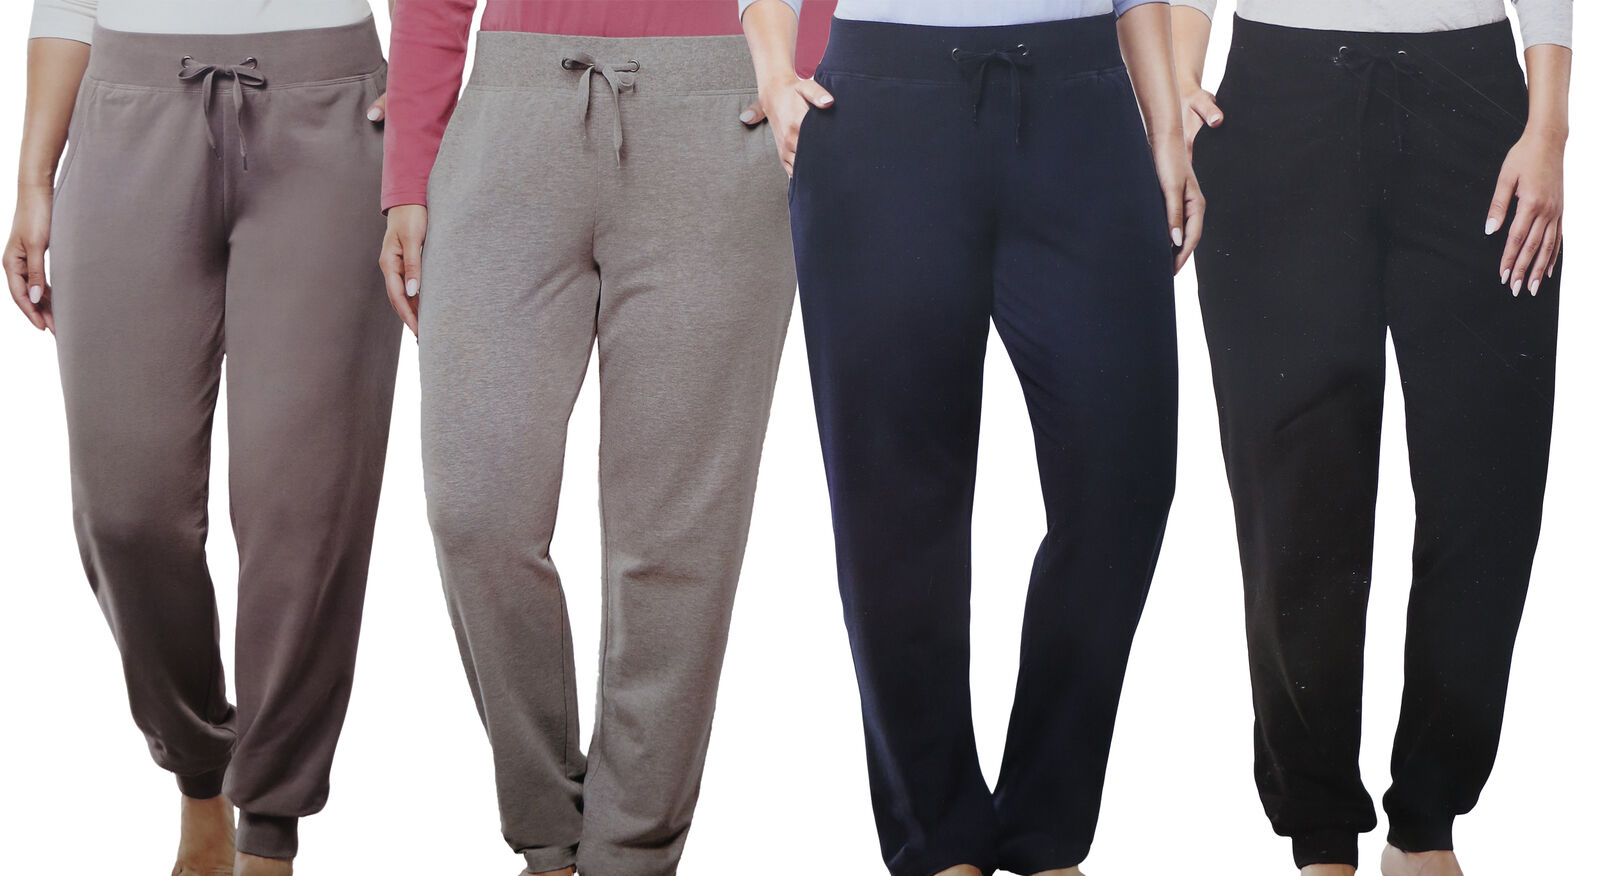 Damen WELLNESSHOSE Jogginghose Wellness Freizeit Sport Hose große Mode 4 Modelle